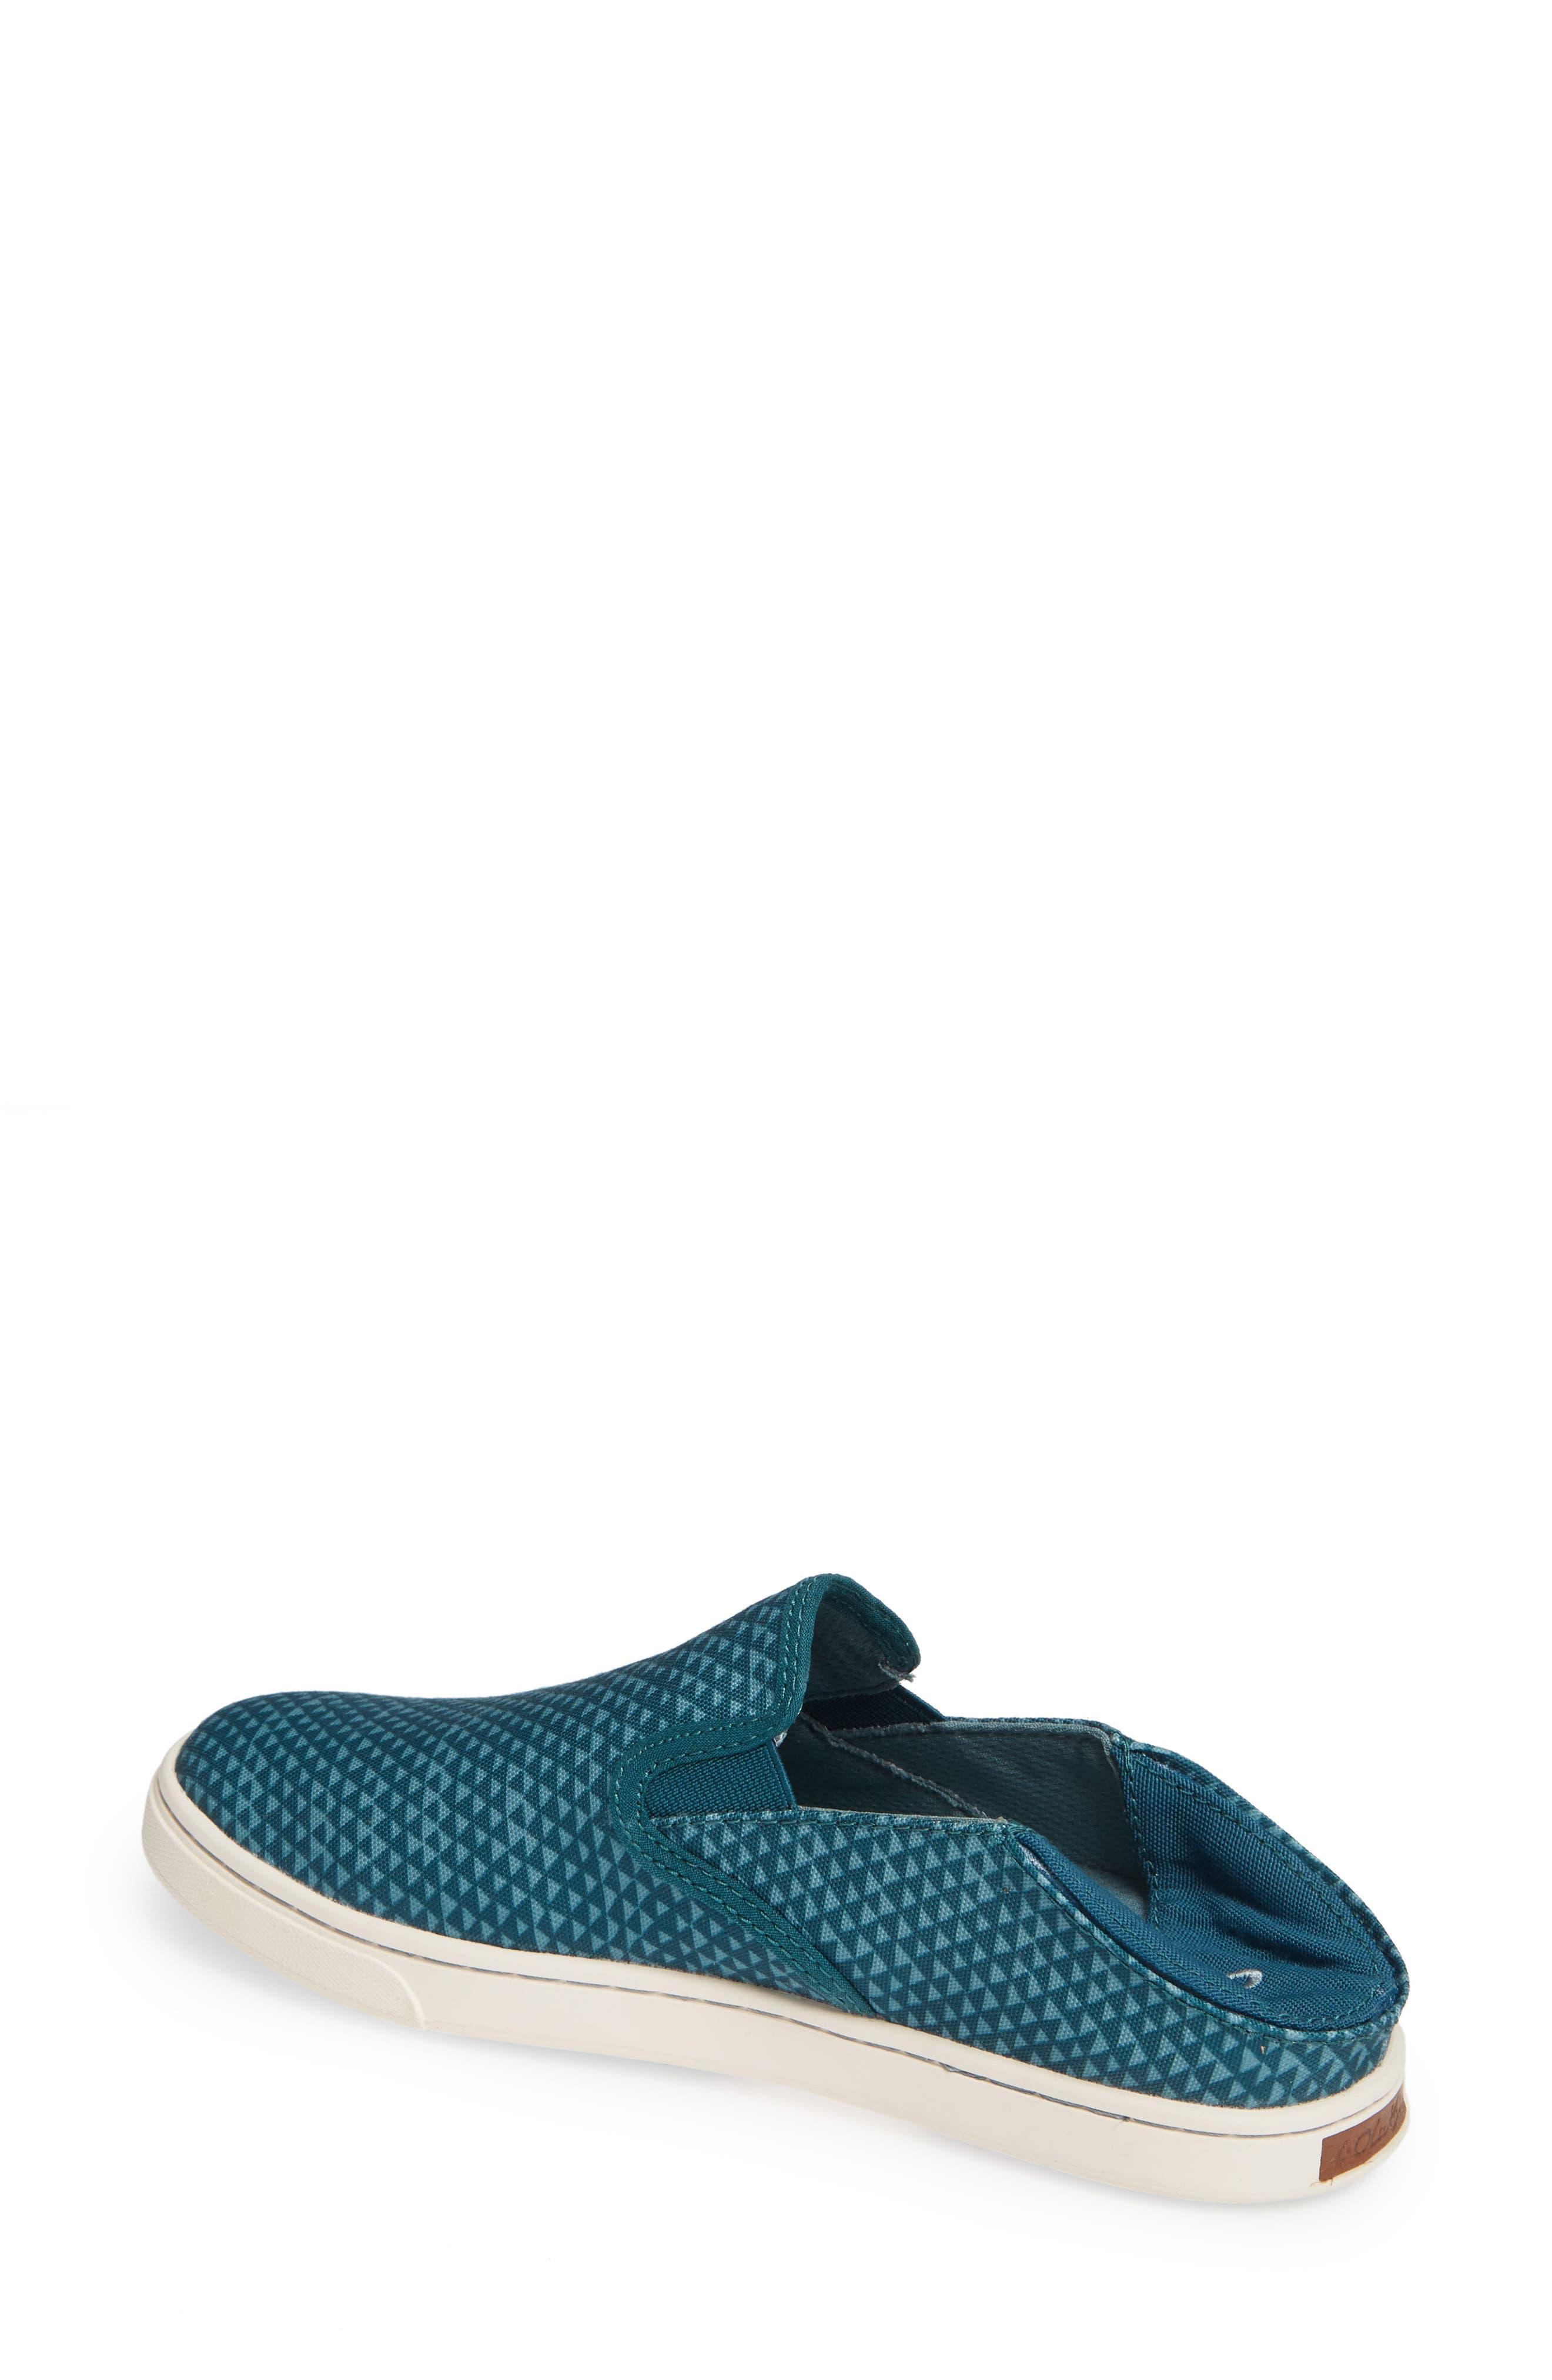 Pehuea Pa'i Convertible Sneaker,                             Alternate thumbnail 3, color,                             DEEP TEAL/ TRIANGLE FABRIC